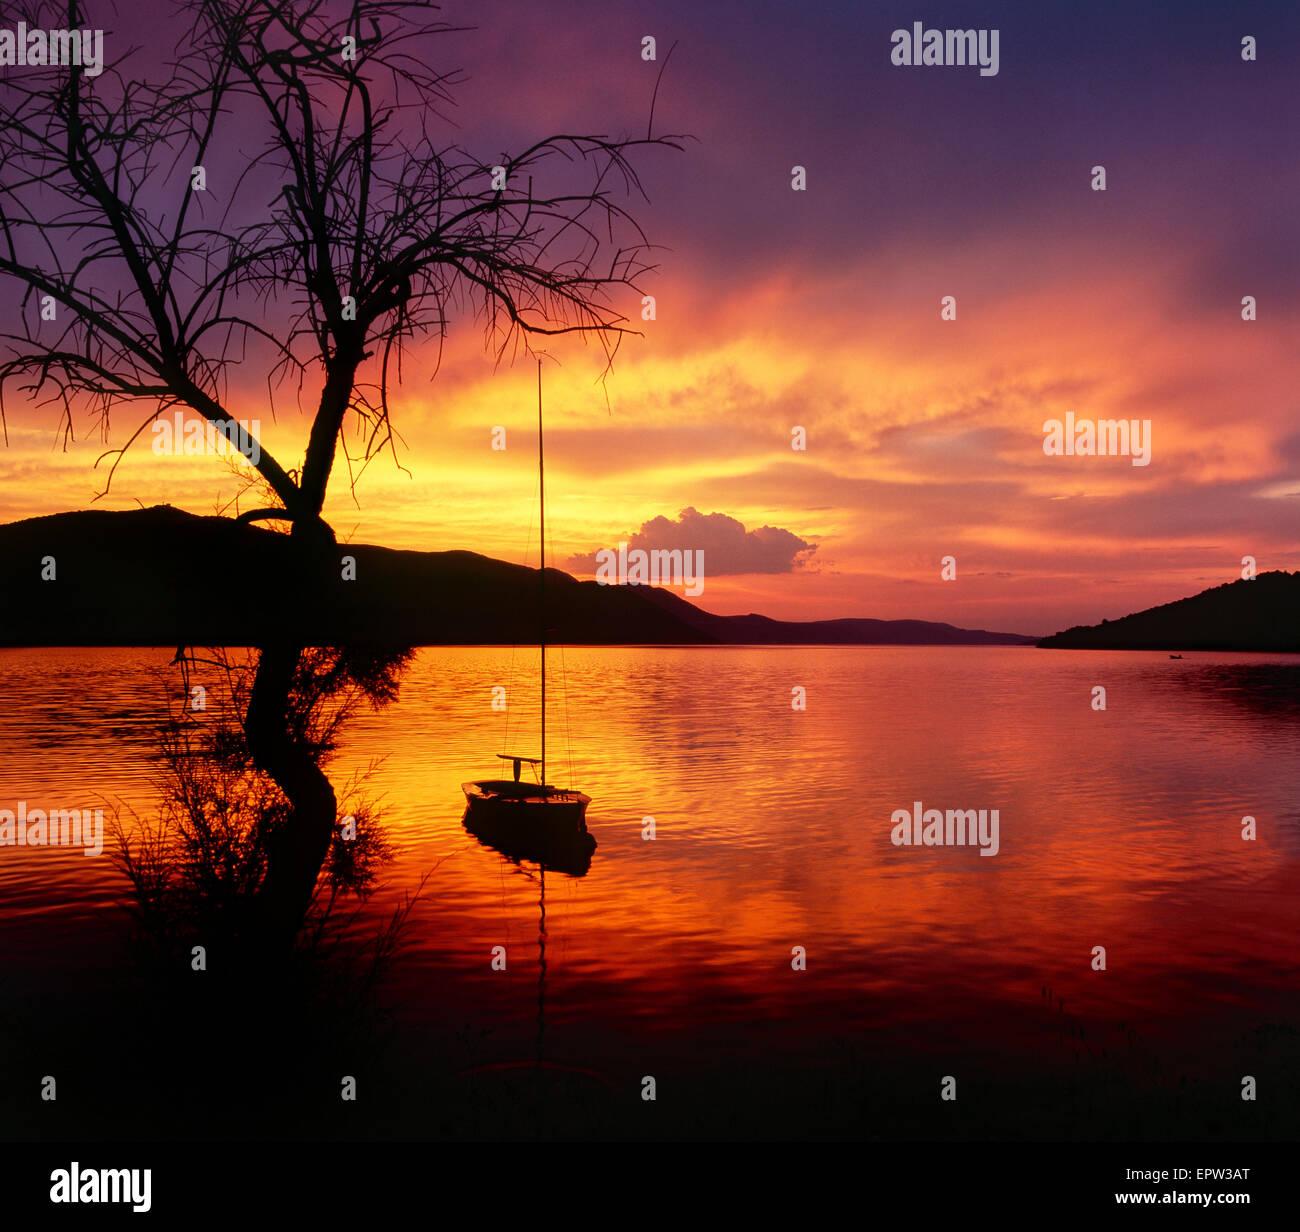 Sonnenuntergang Landschaft. Drei und Segelboot im Sonnenuntergang am Meer. Stockbild